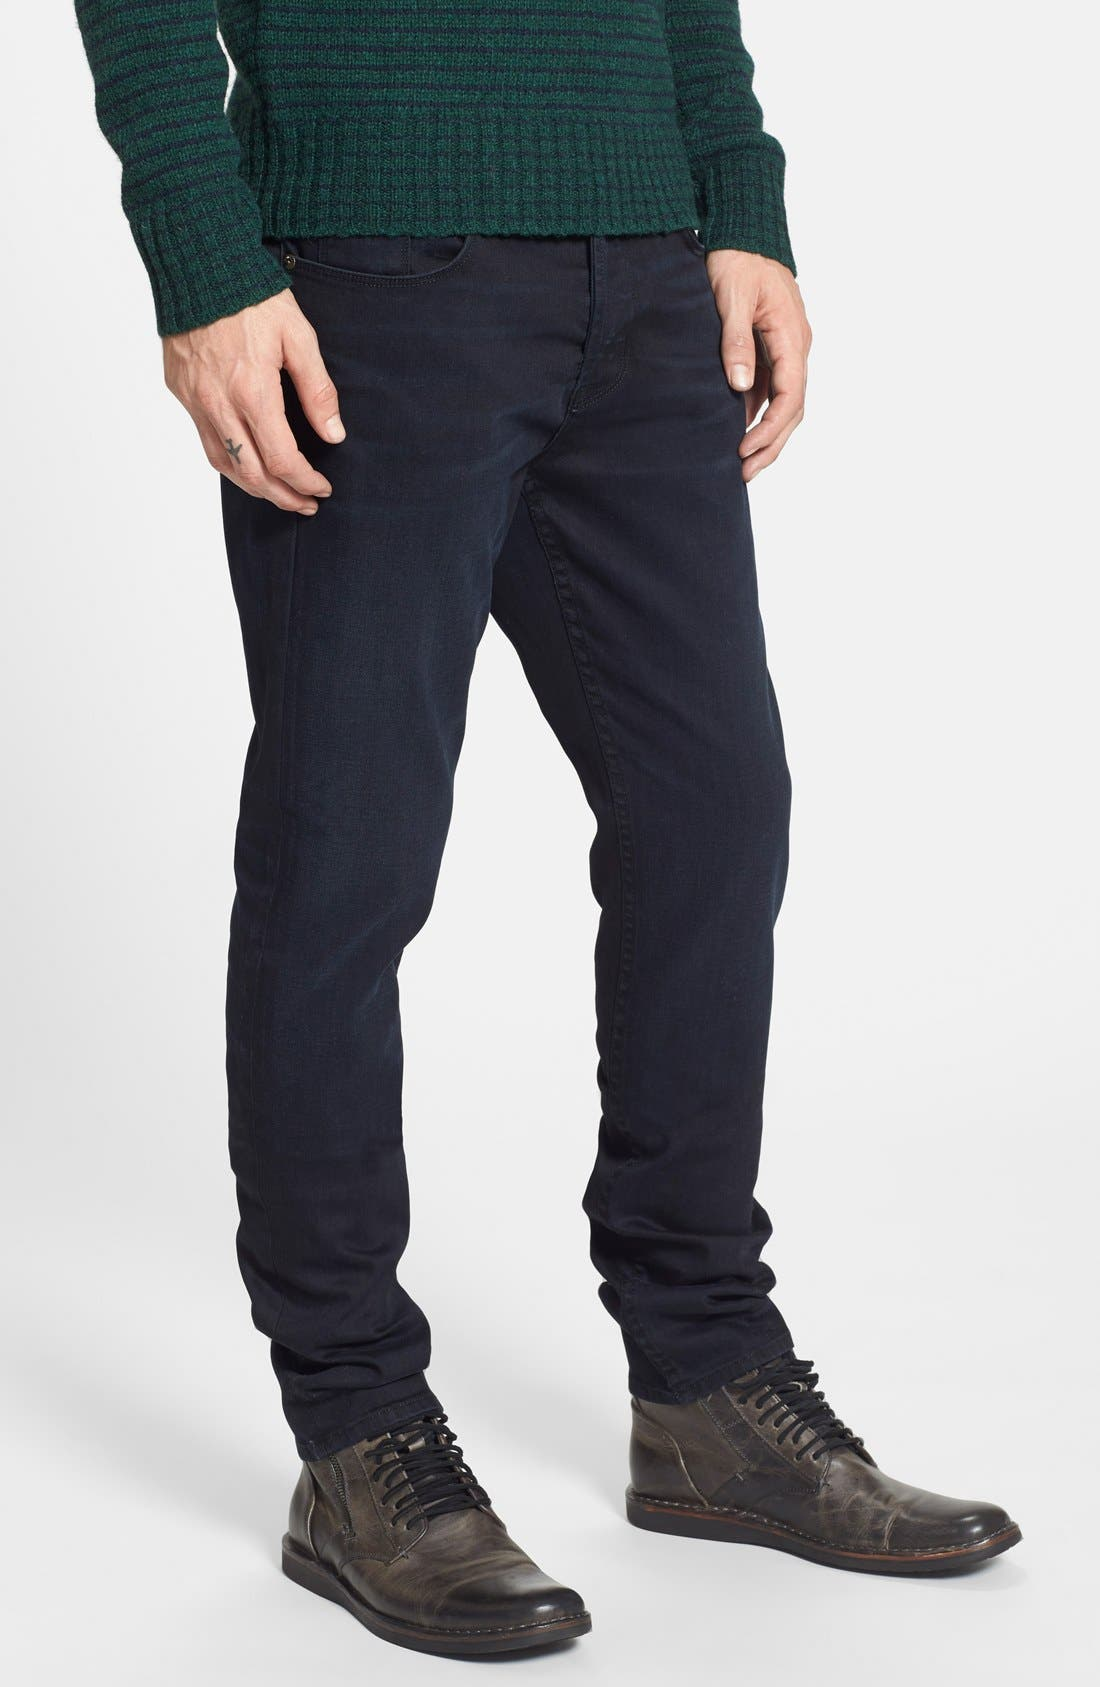 Alternate Image 3  - Hudson Jeans 'Sartor' Slouchy Skinny Fit Jeans (Sanction)